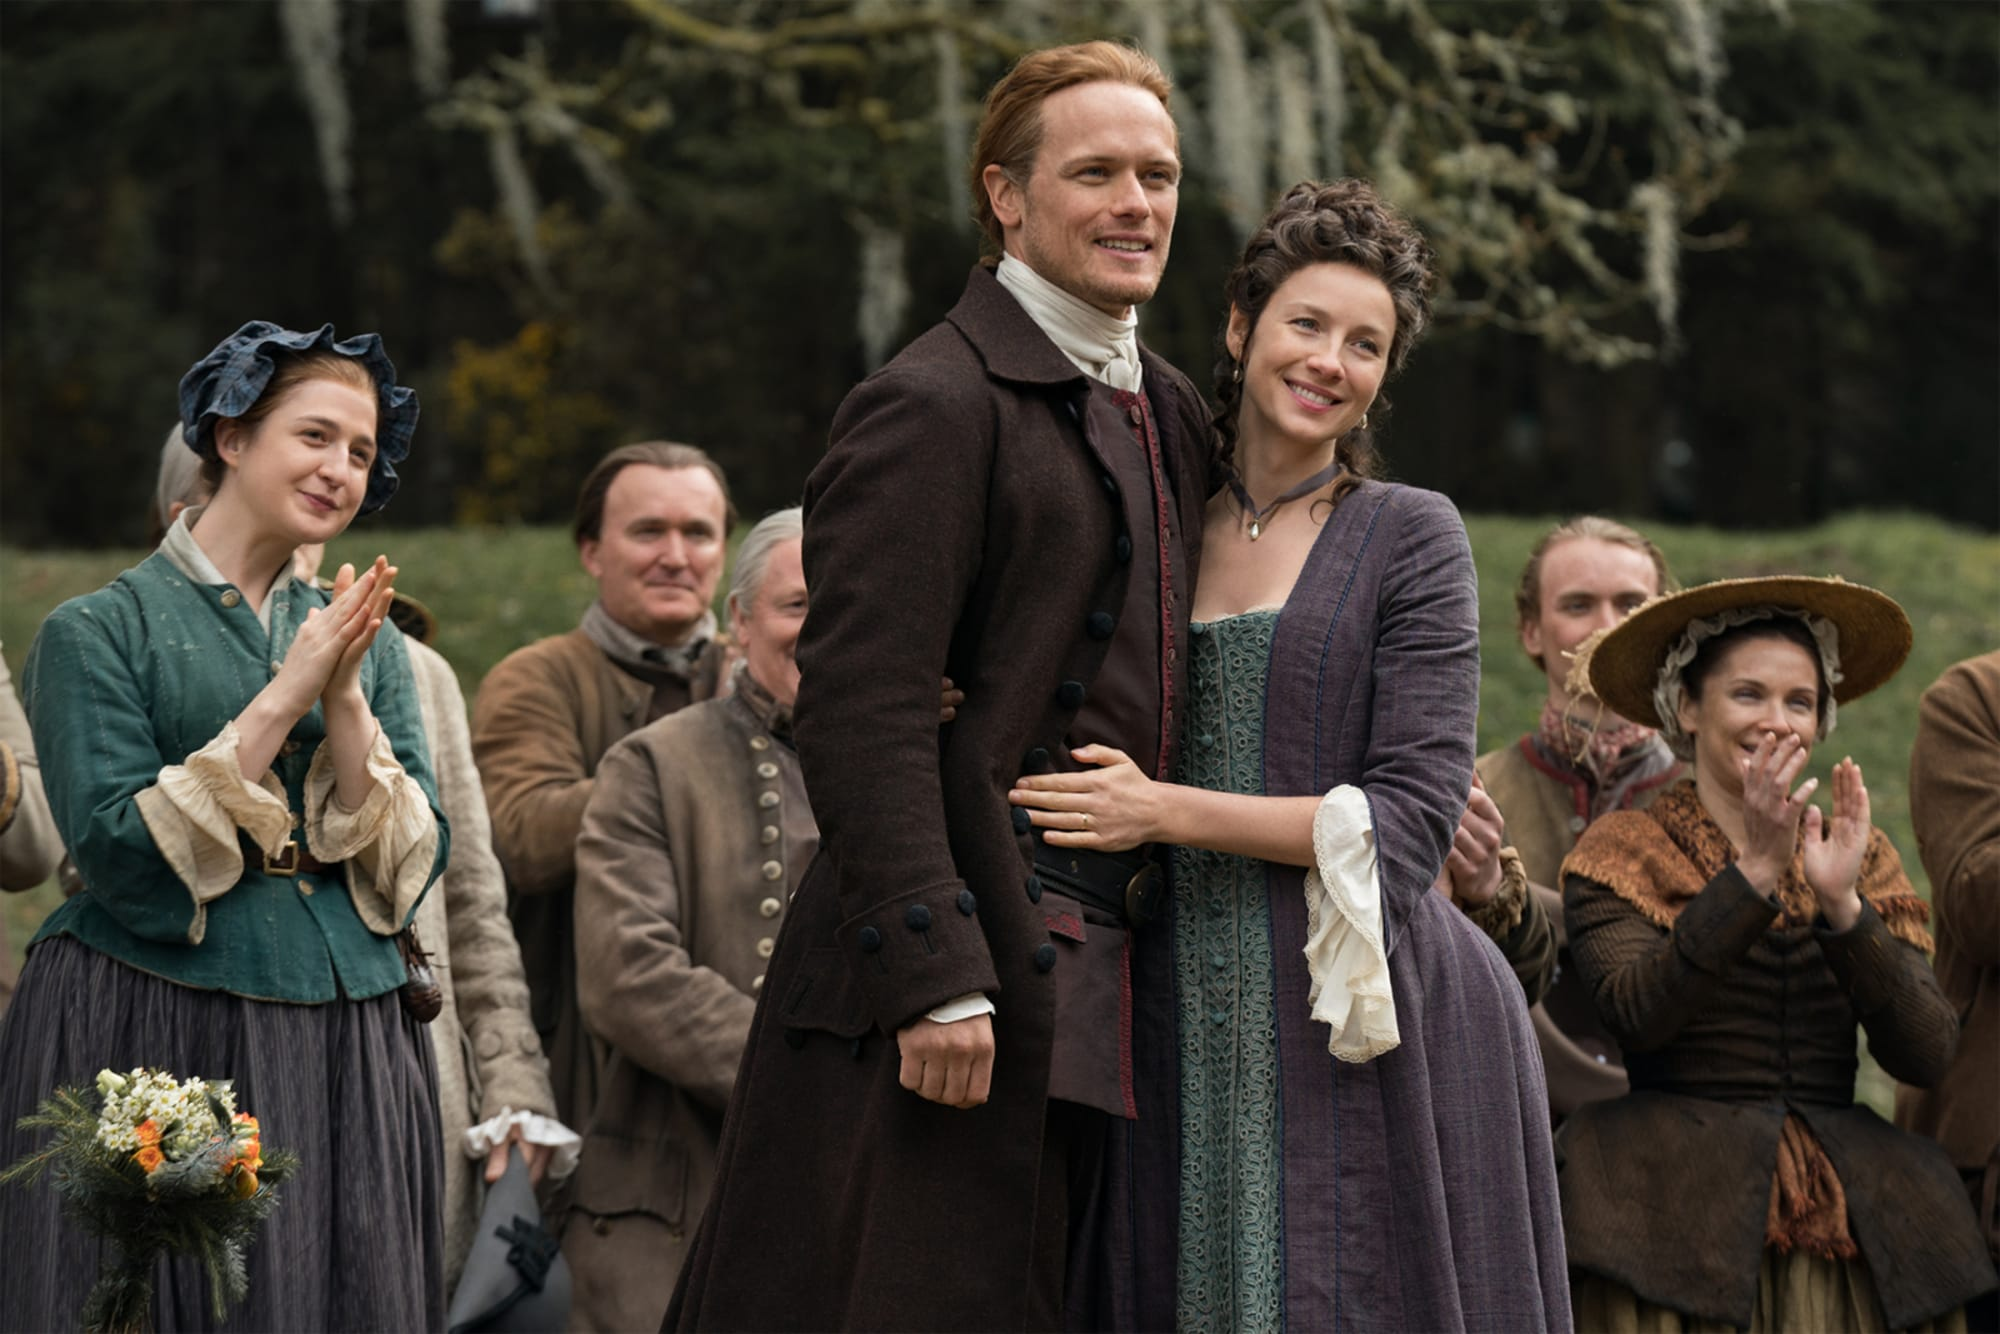 Sam Heughan invites Bollywood star Kirron Kher to Outlander set amid cancer battle